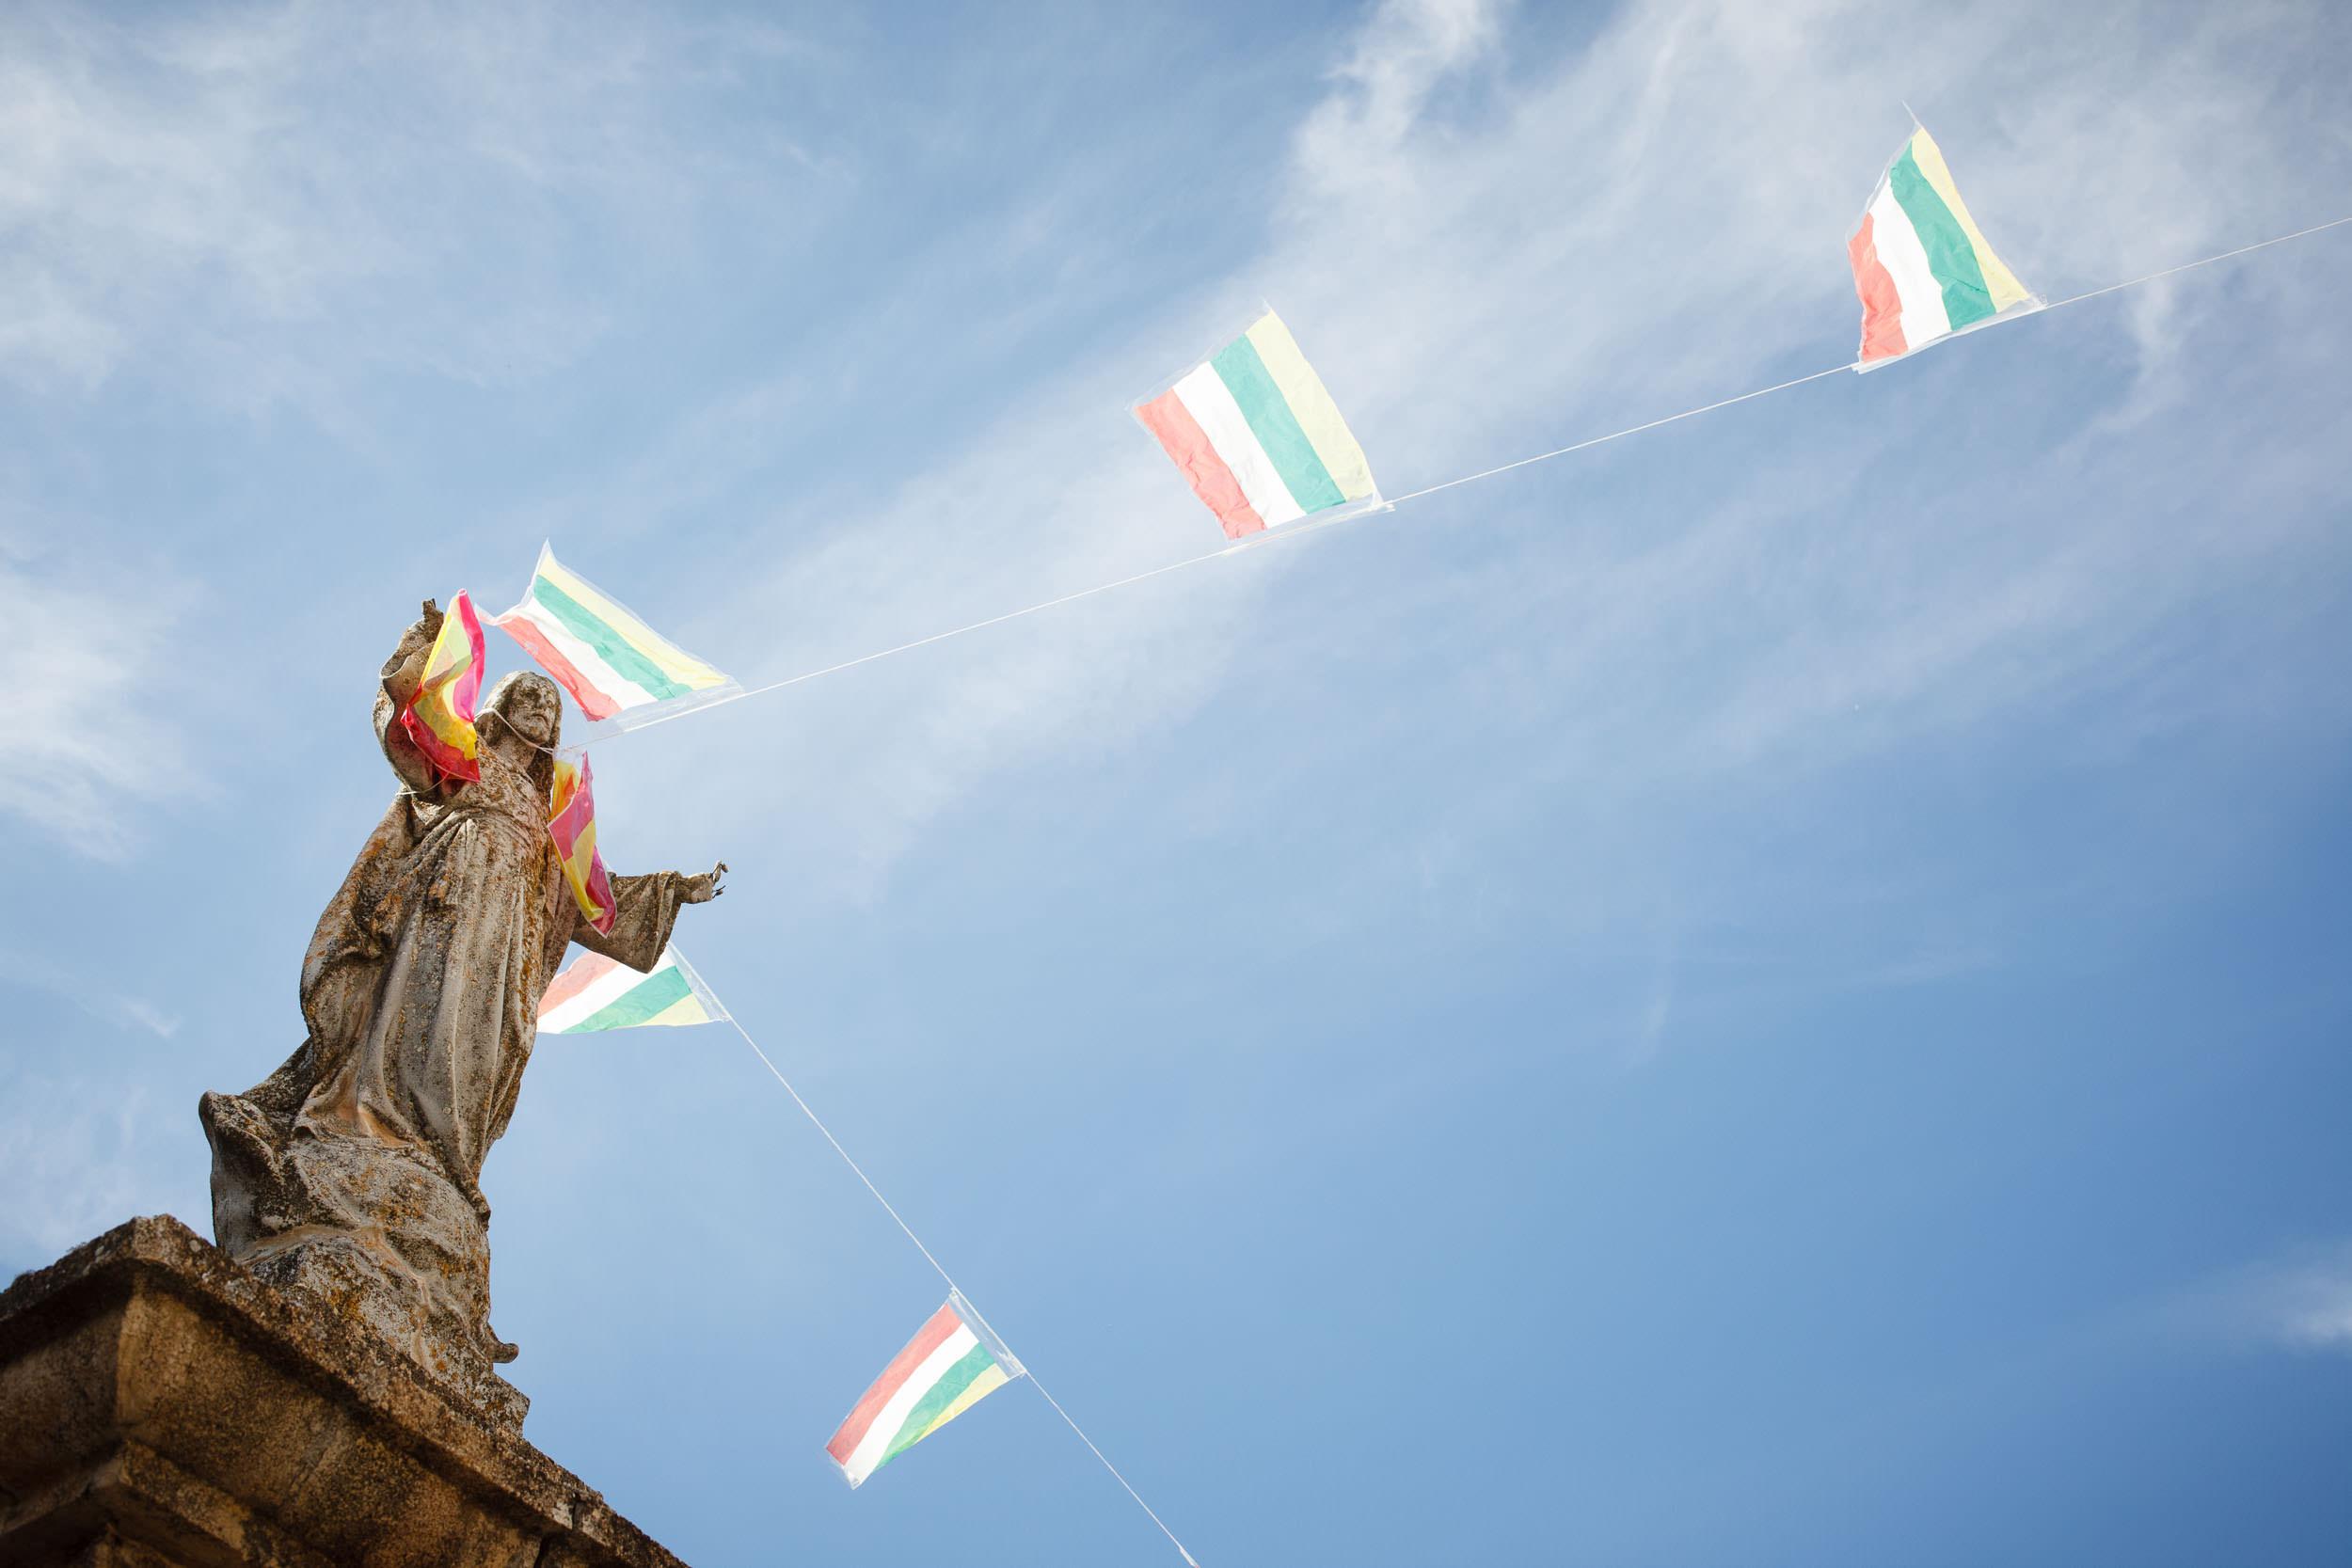 13/09/14 Bandera de La Rioja en Manzanares, cerca de Cirueña, La Rioja, España. Foto @ James Sturcke   www.sturcke.org